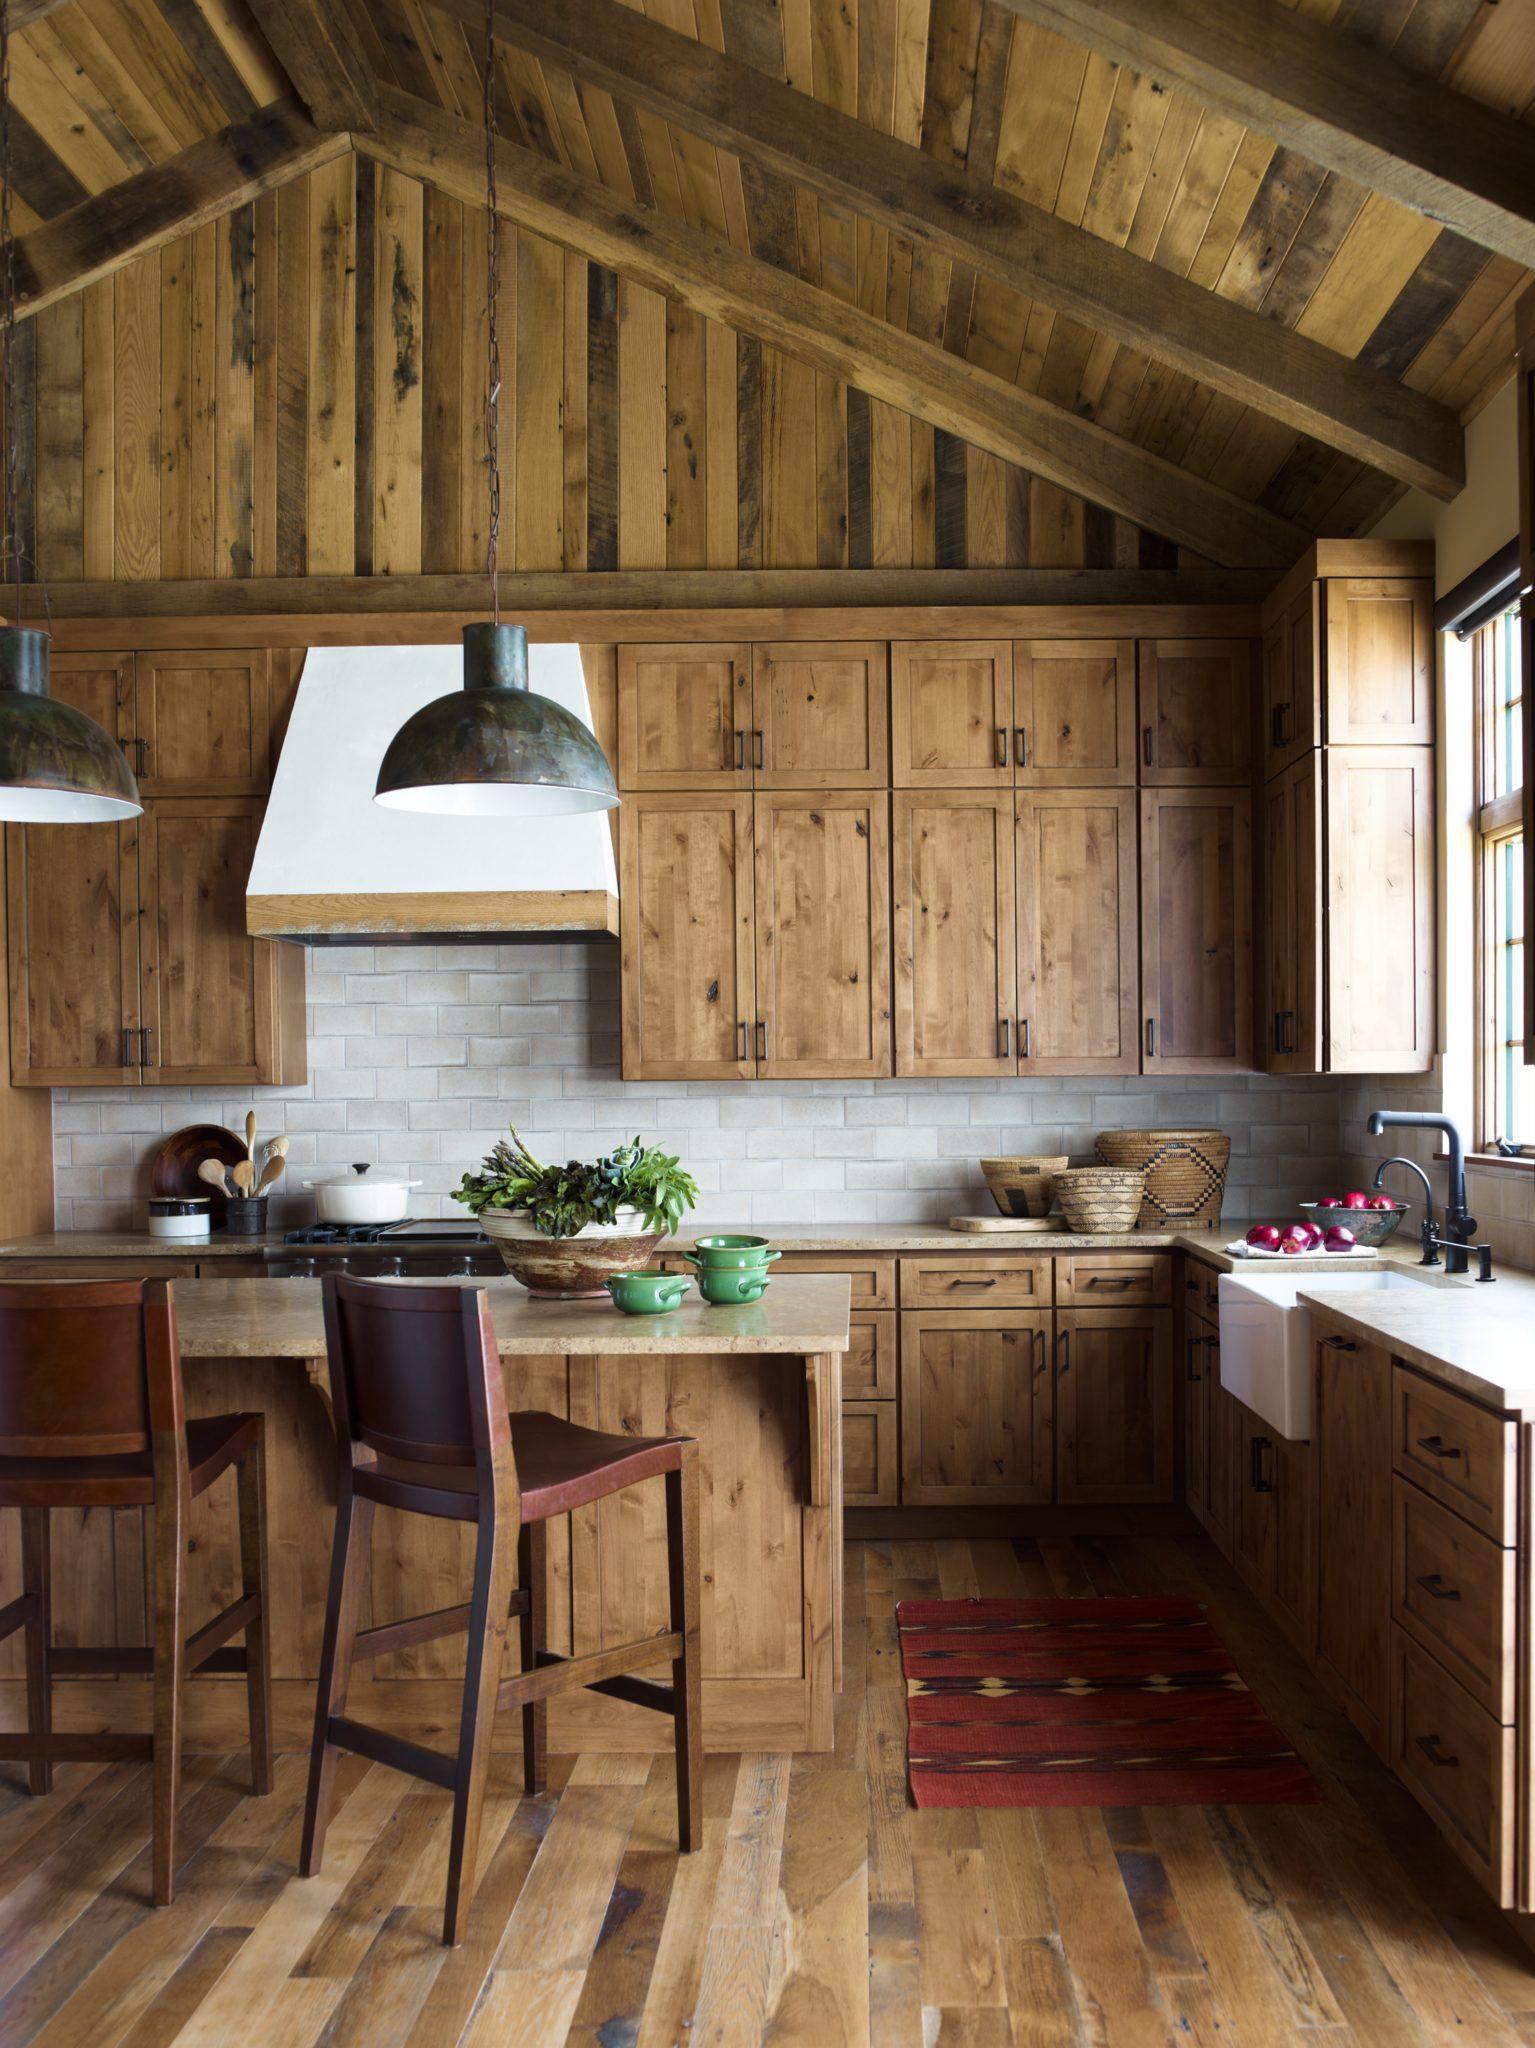 Rustic Montana Retreat - Kitchen by Kylee Shintaffer